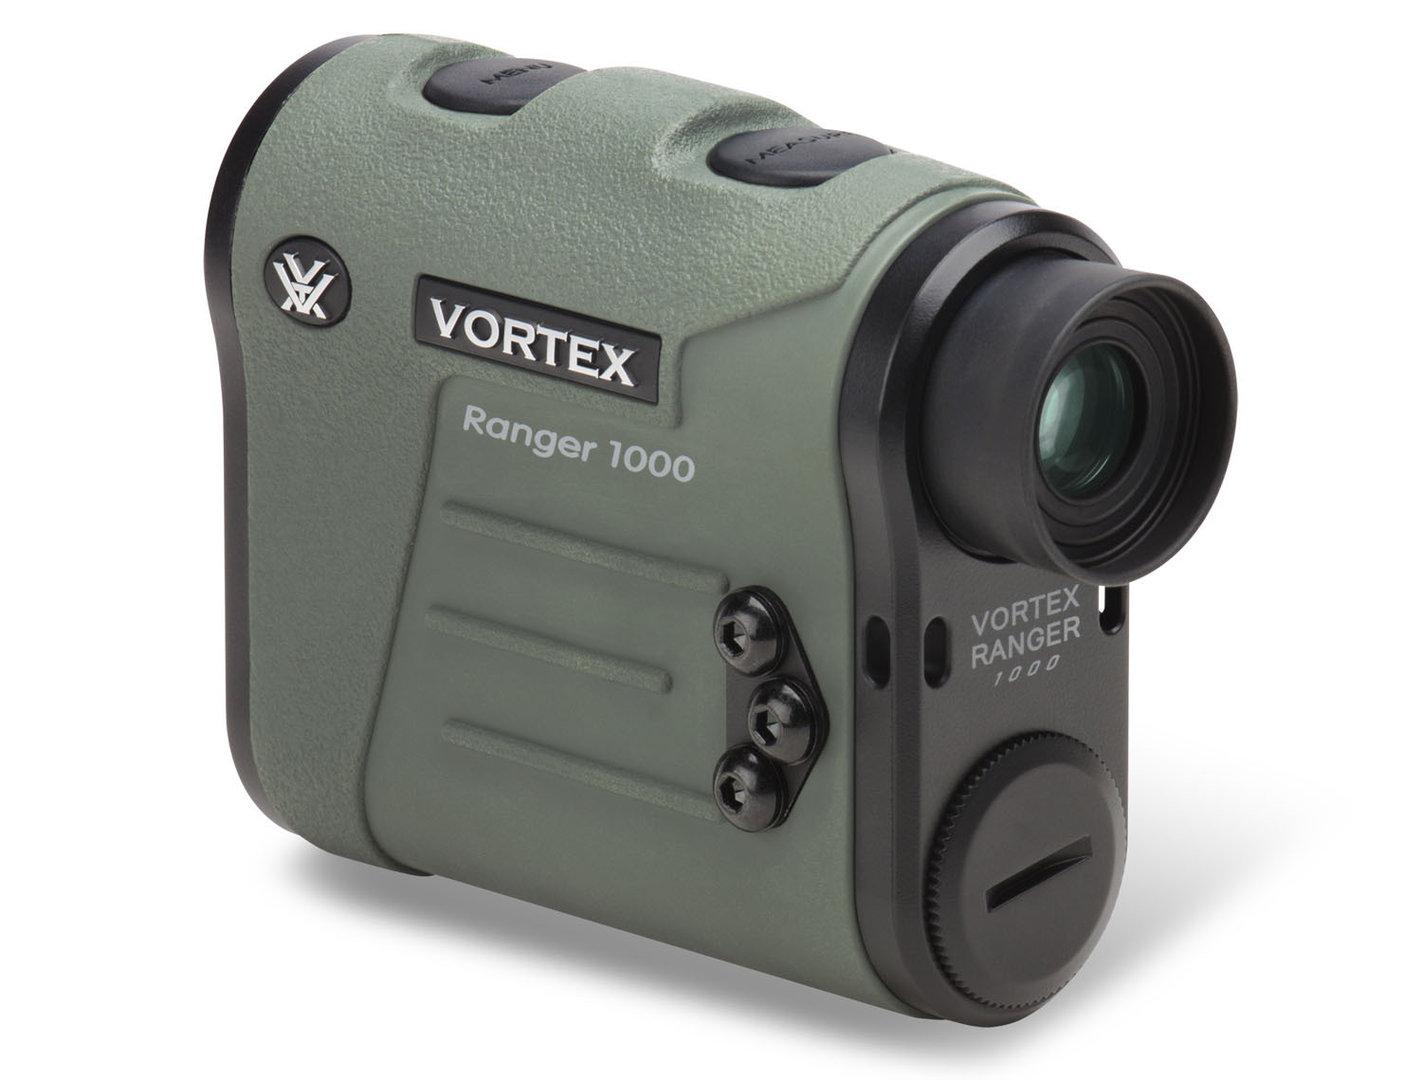 Bushnell Entfernungsmesser Opinie : Entfernungsmesser jagd günstig vektor optik laser